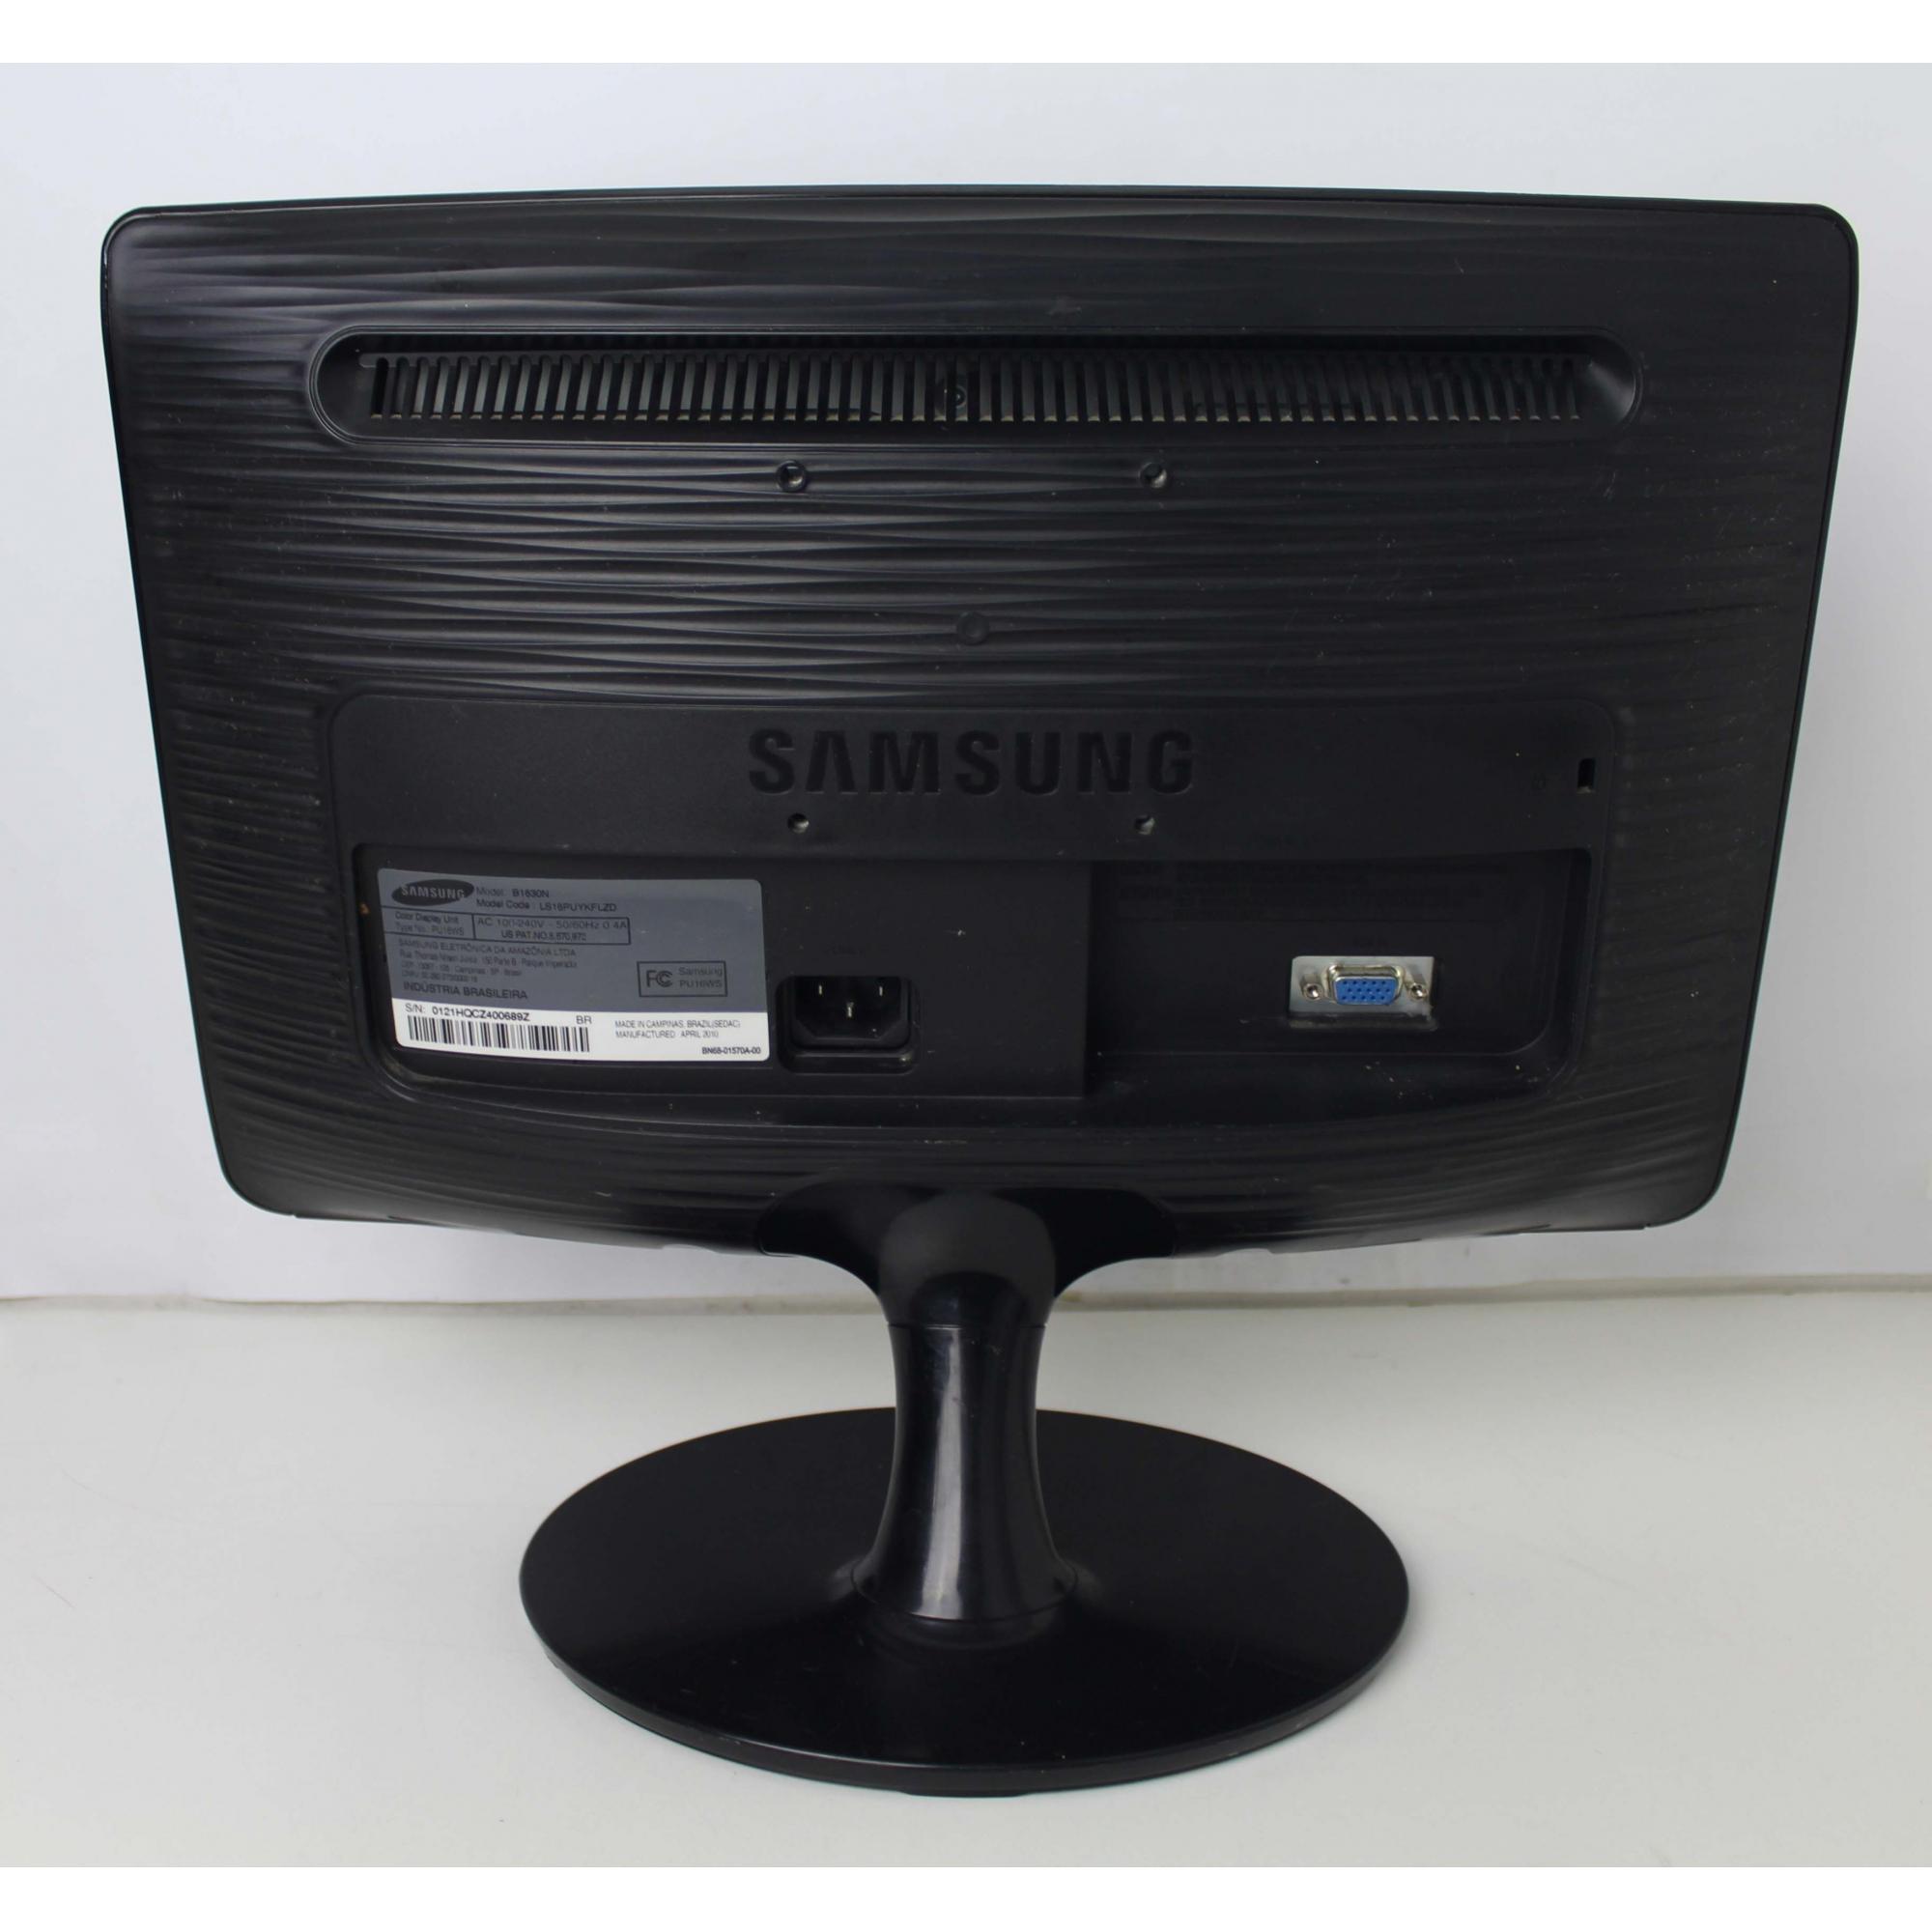 MONITOR SAMSUNG SYNCMASTER B1630 15.6 POLEGADAS - LCD